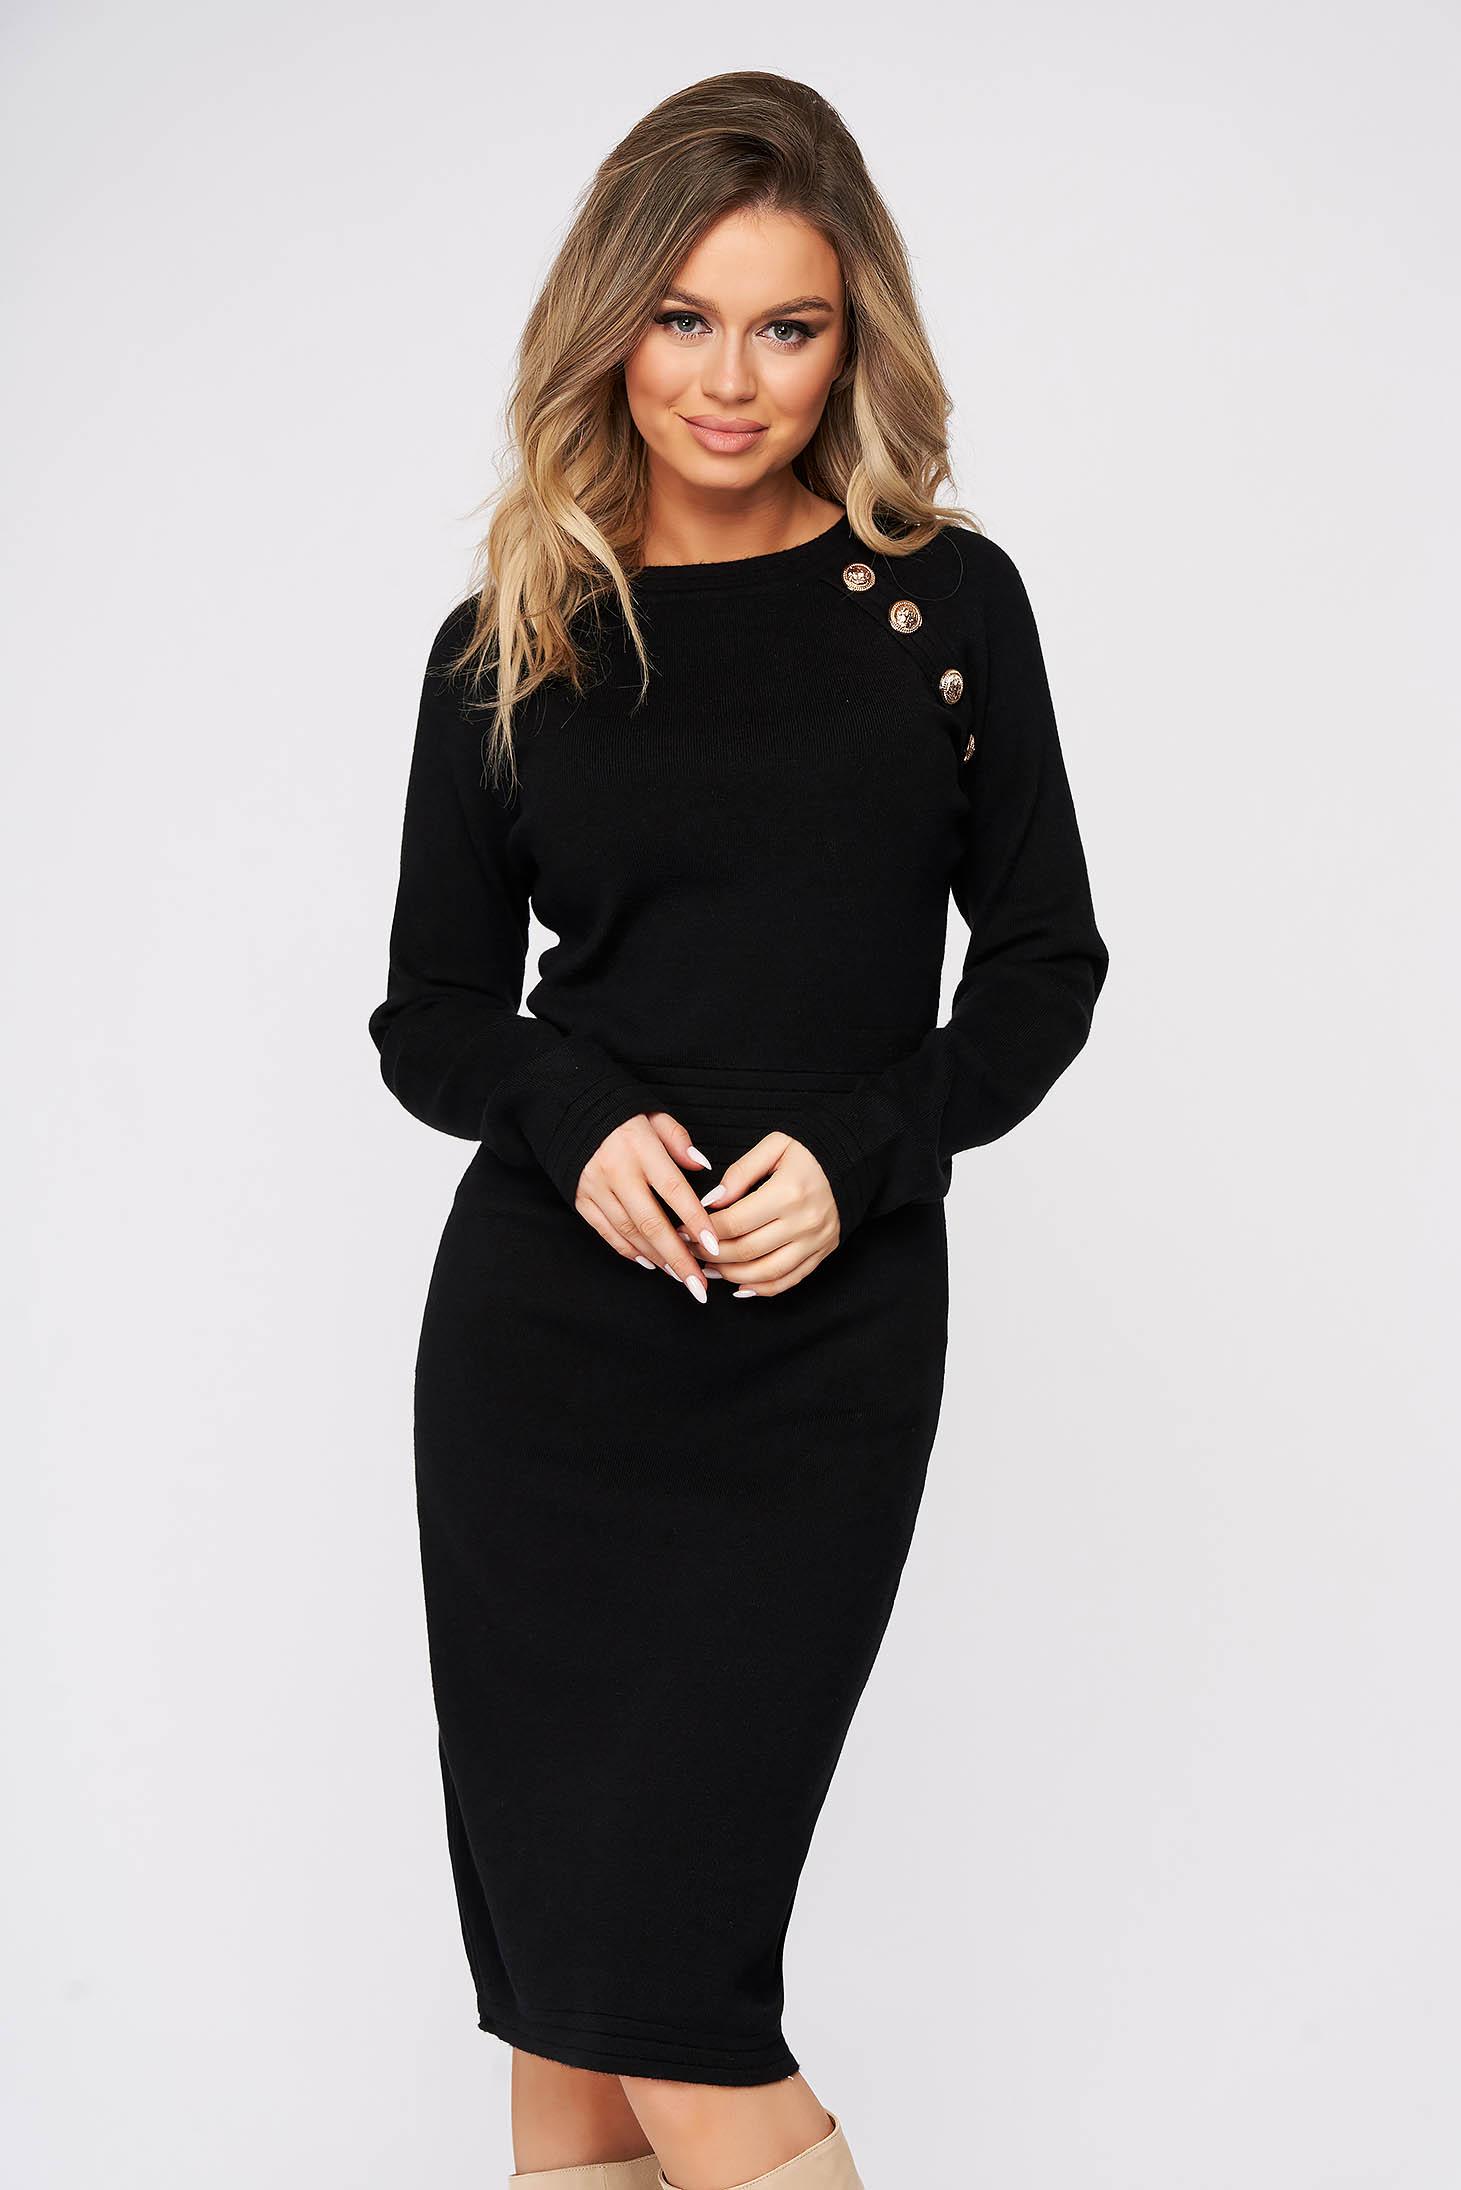 Rochie SunShine neagra midi tip creion din material tricotat accesorizata cu nasturi